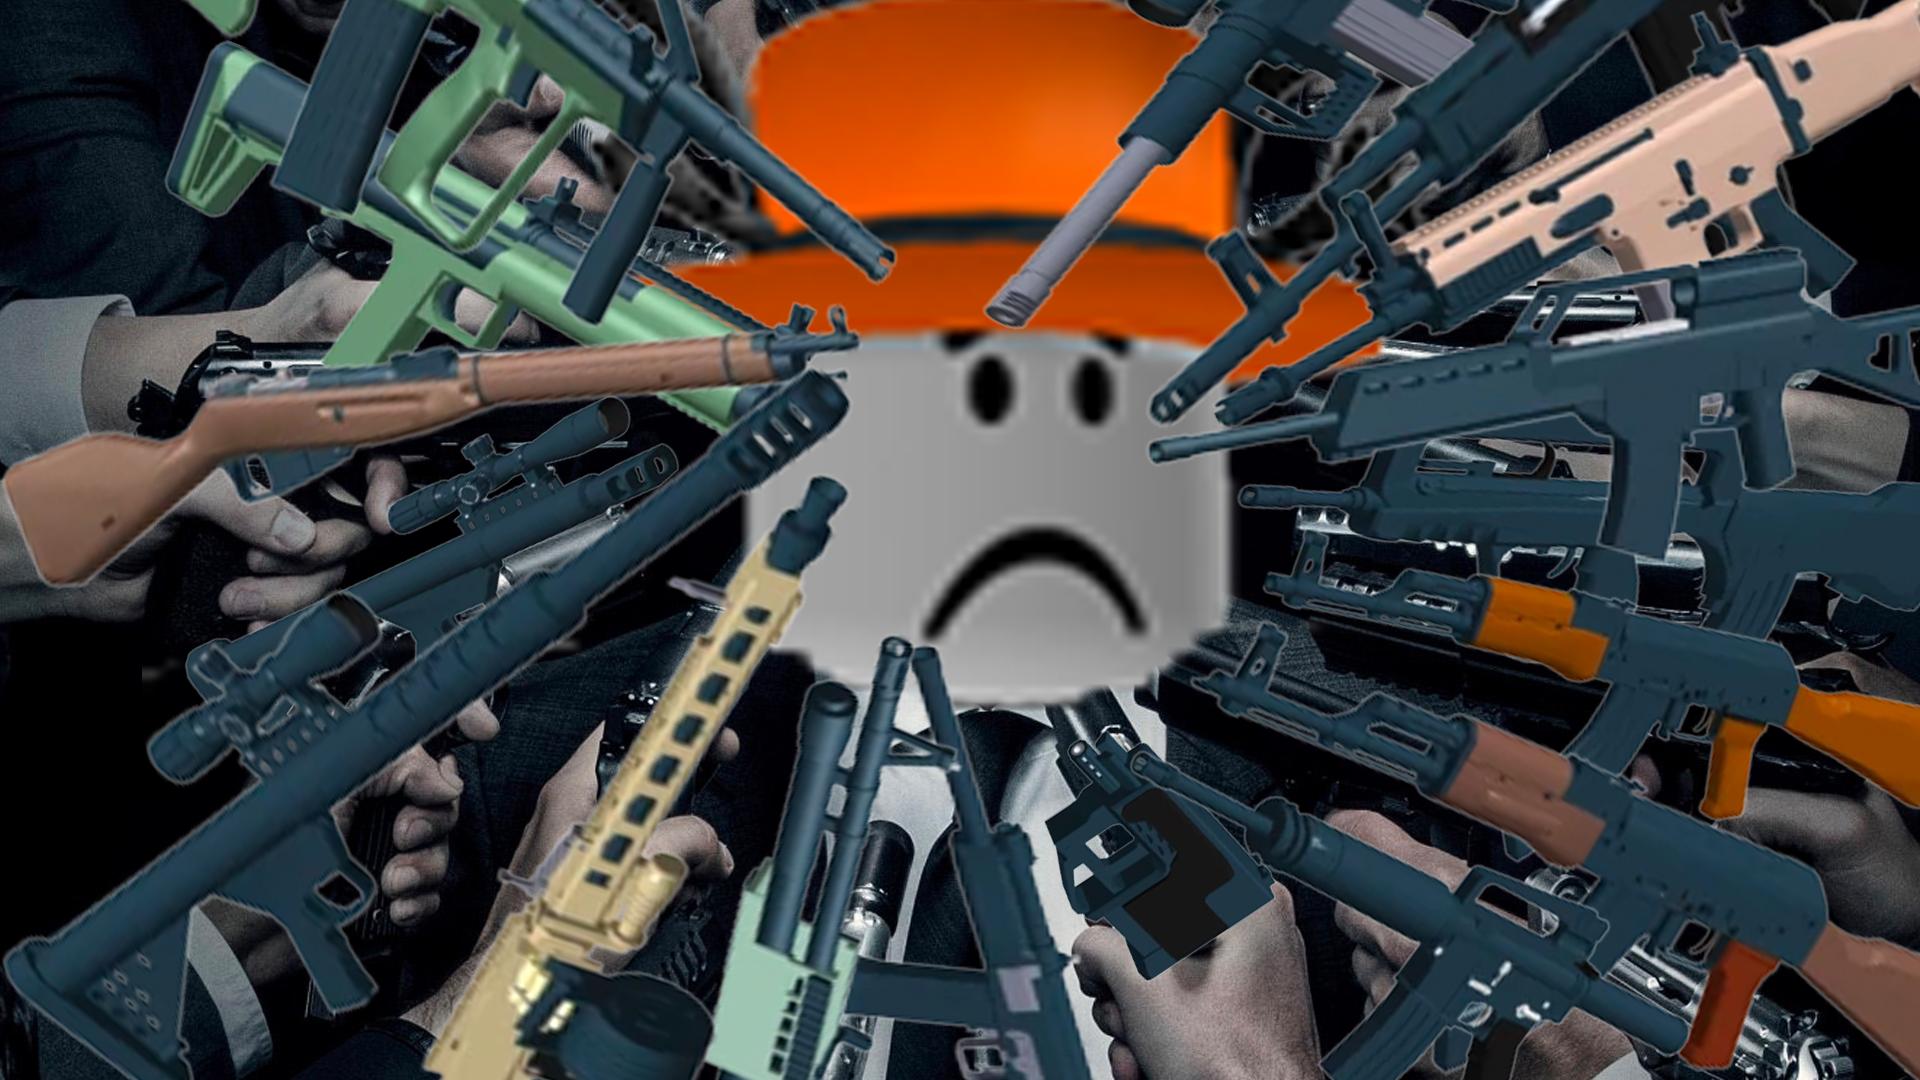 Trucks Hidden Guns Team Deathmatch Image Roblox Suggestions Mk Vii Phantom Forces Wiki Fandom